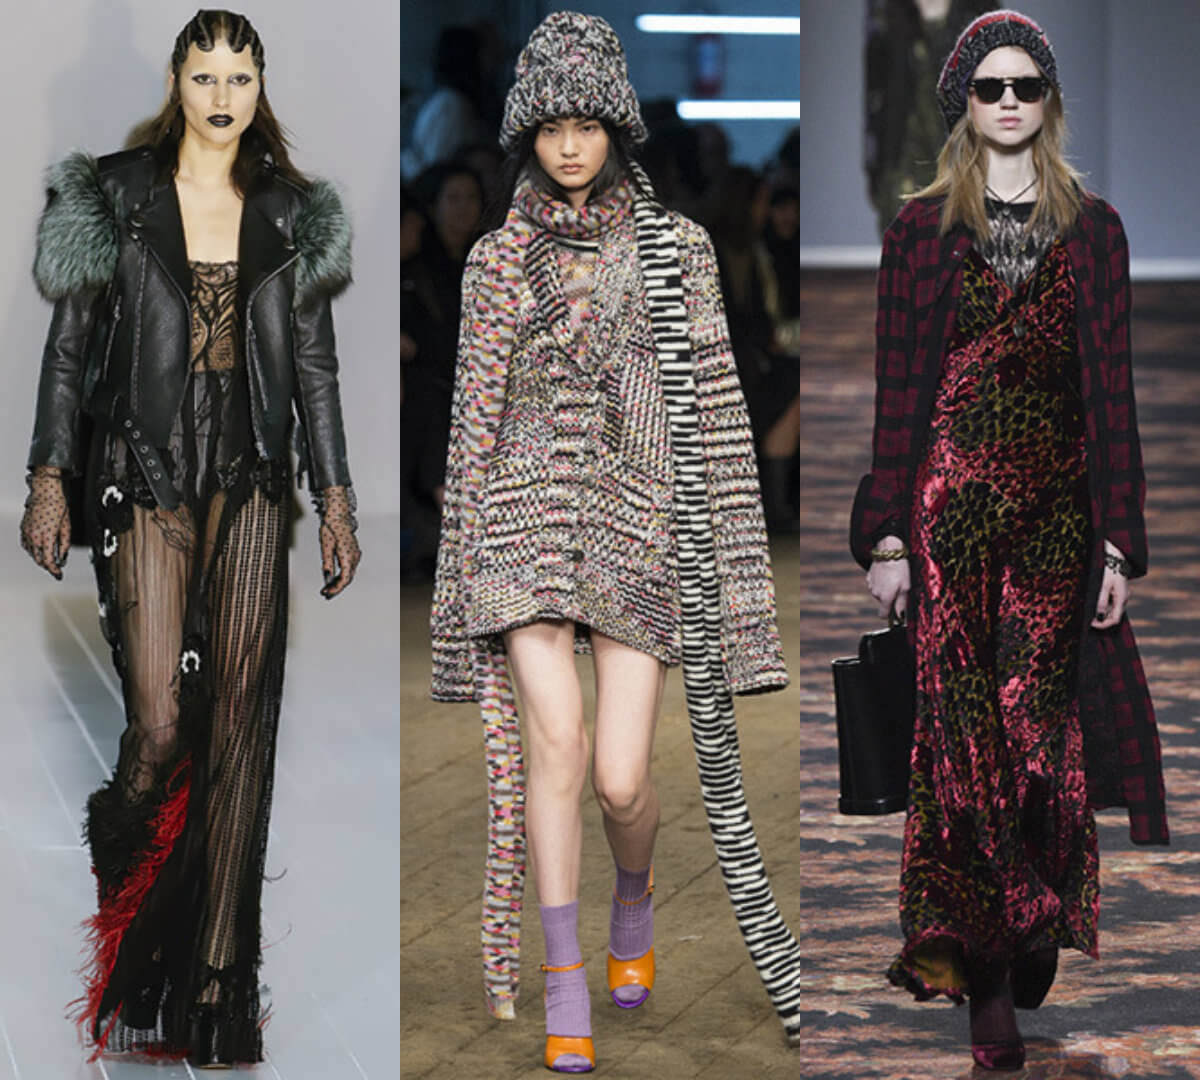 Одежда в стиле гранж мода оень 2017 зима 2017